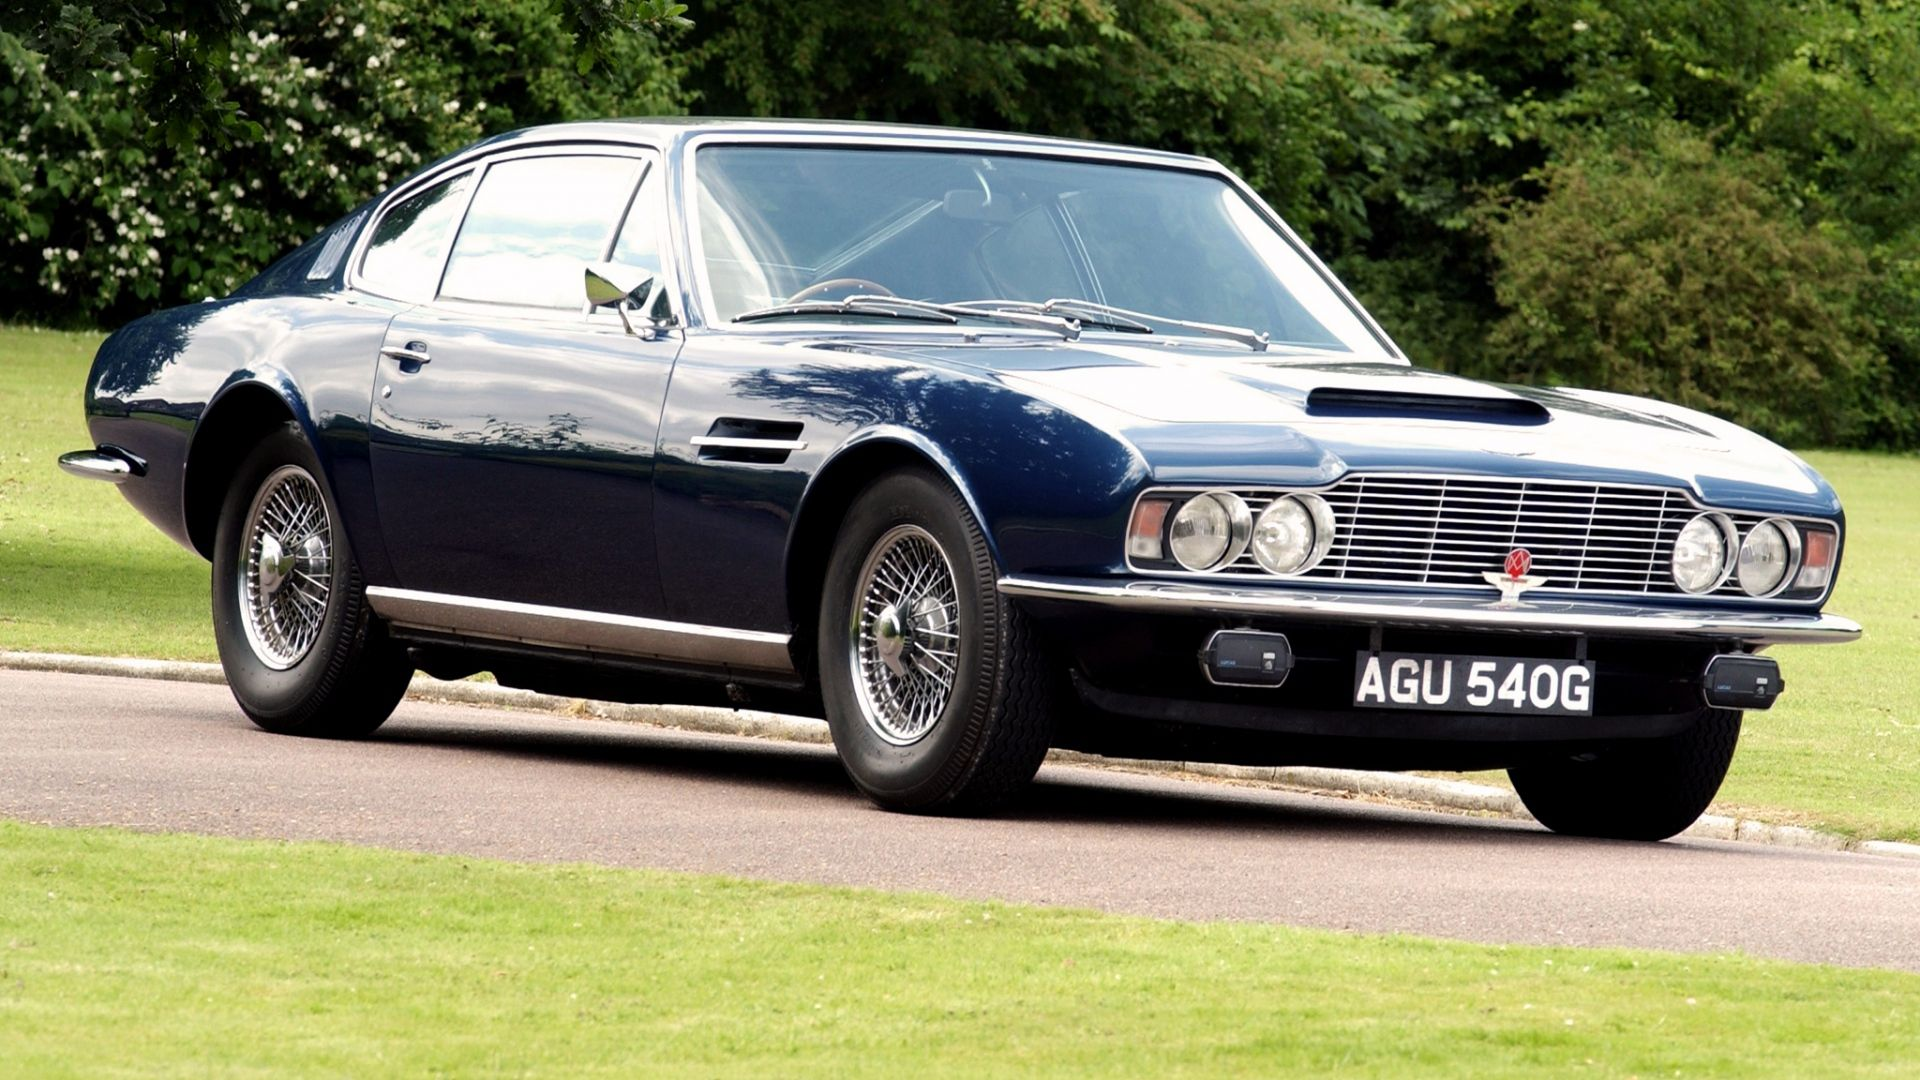 Download Wallpaper 1920x1080 Aston Martin Dbs Blue Side View Retro Trees Full Hd 1080p Hd Background Aston Martin Dbs Aston Martin Voiture